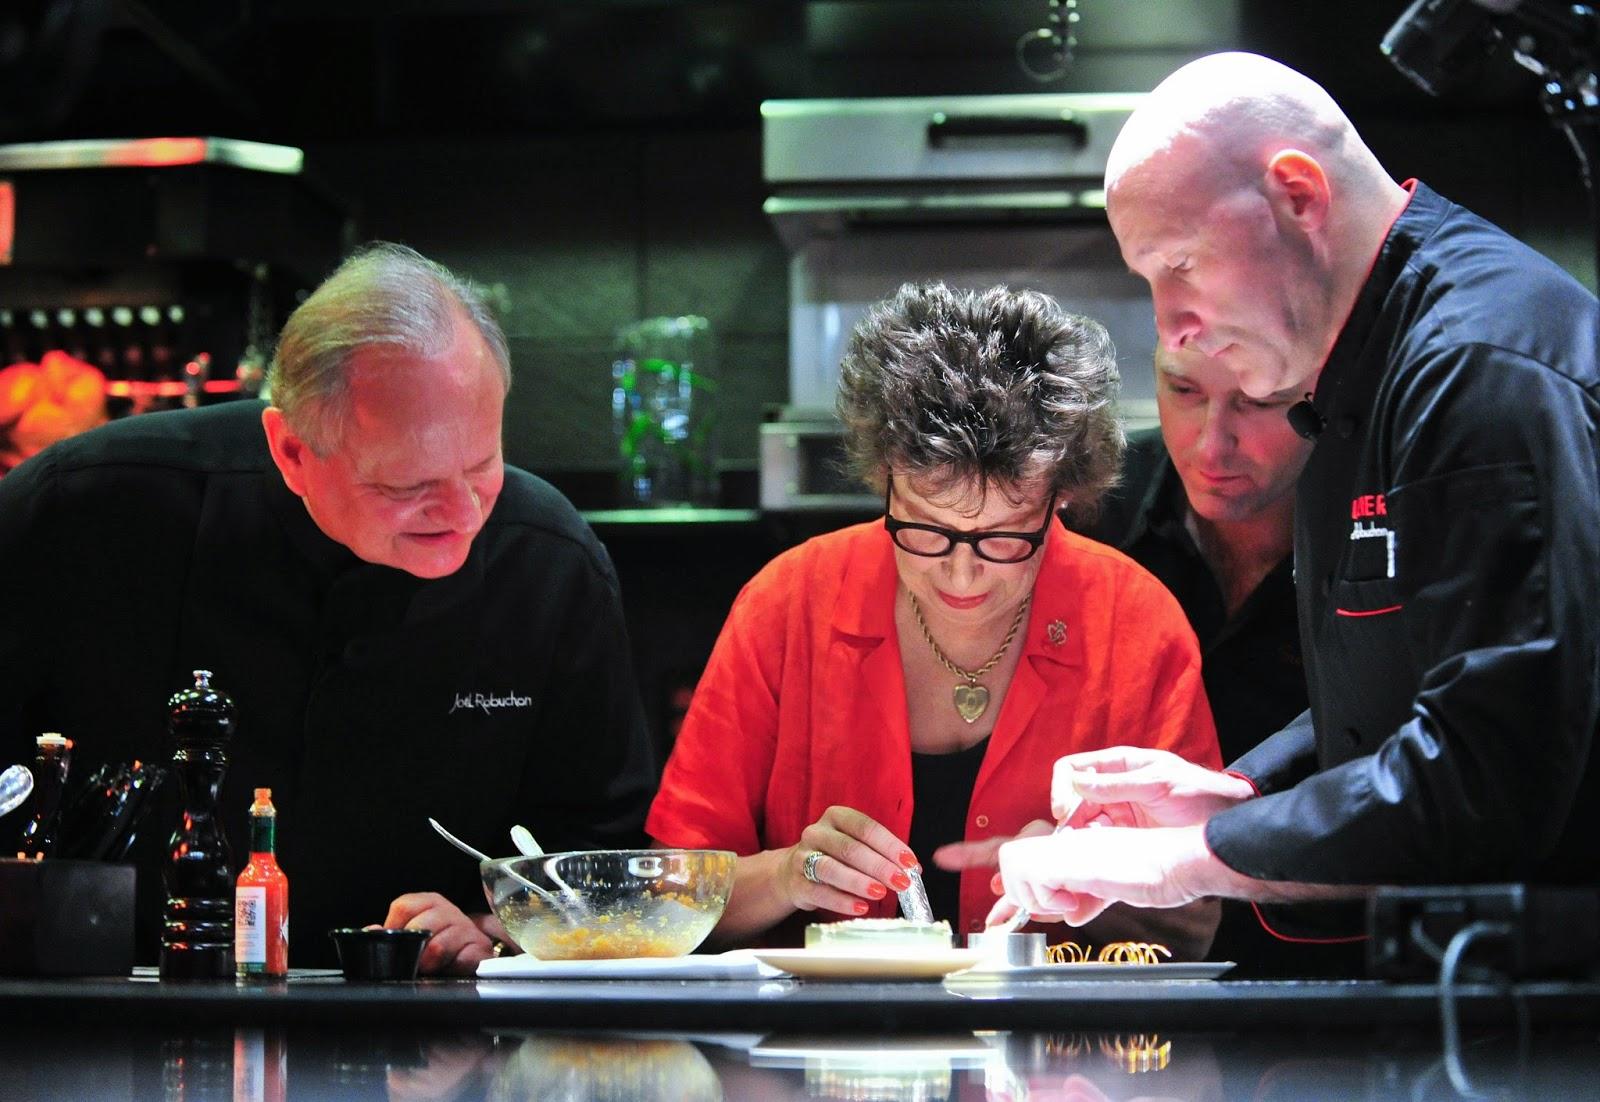 2014 Vegas UnCork'd Joel Robucvhon Cooking demo L'Atelier de Joel Robuchon